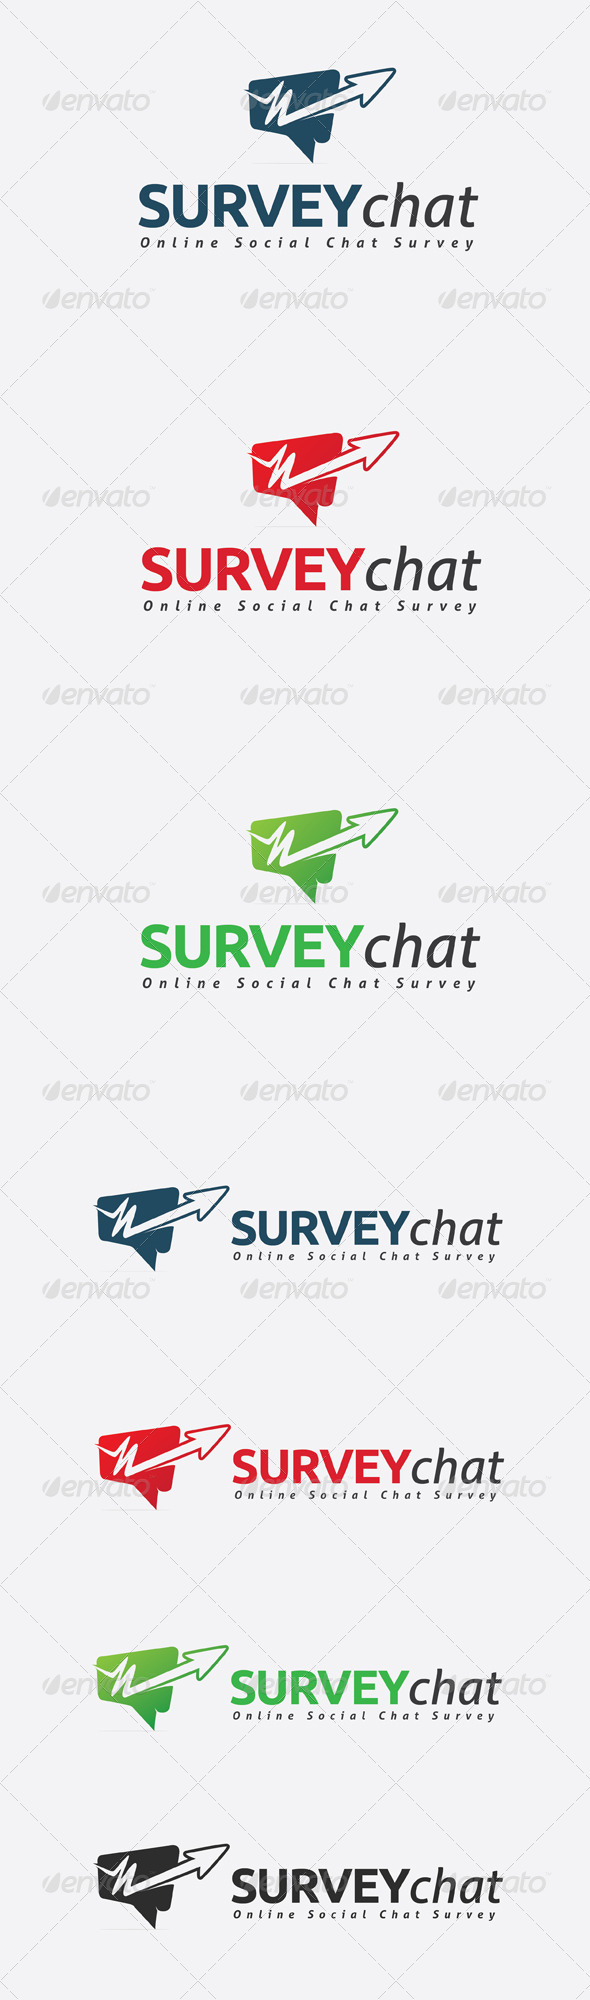 GraphicRiver Survey Chat Logo 6623214